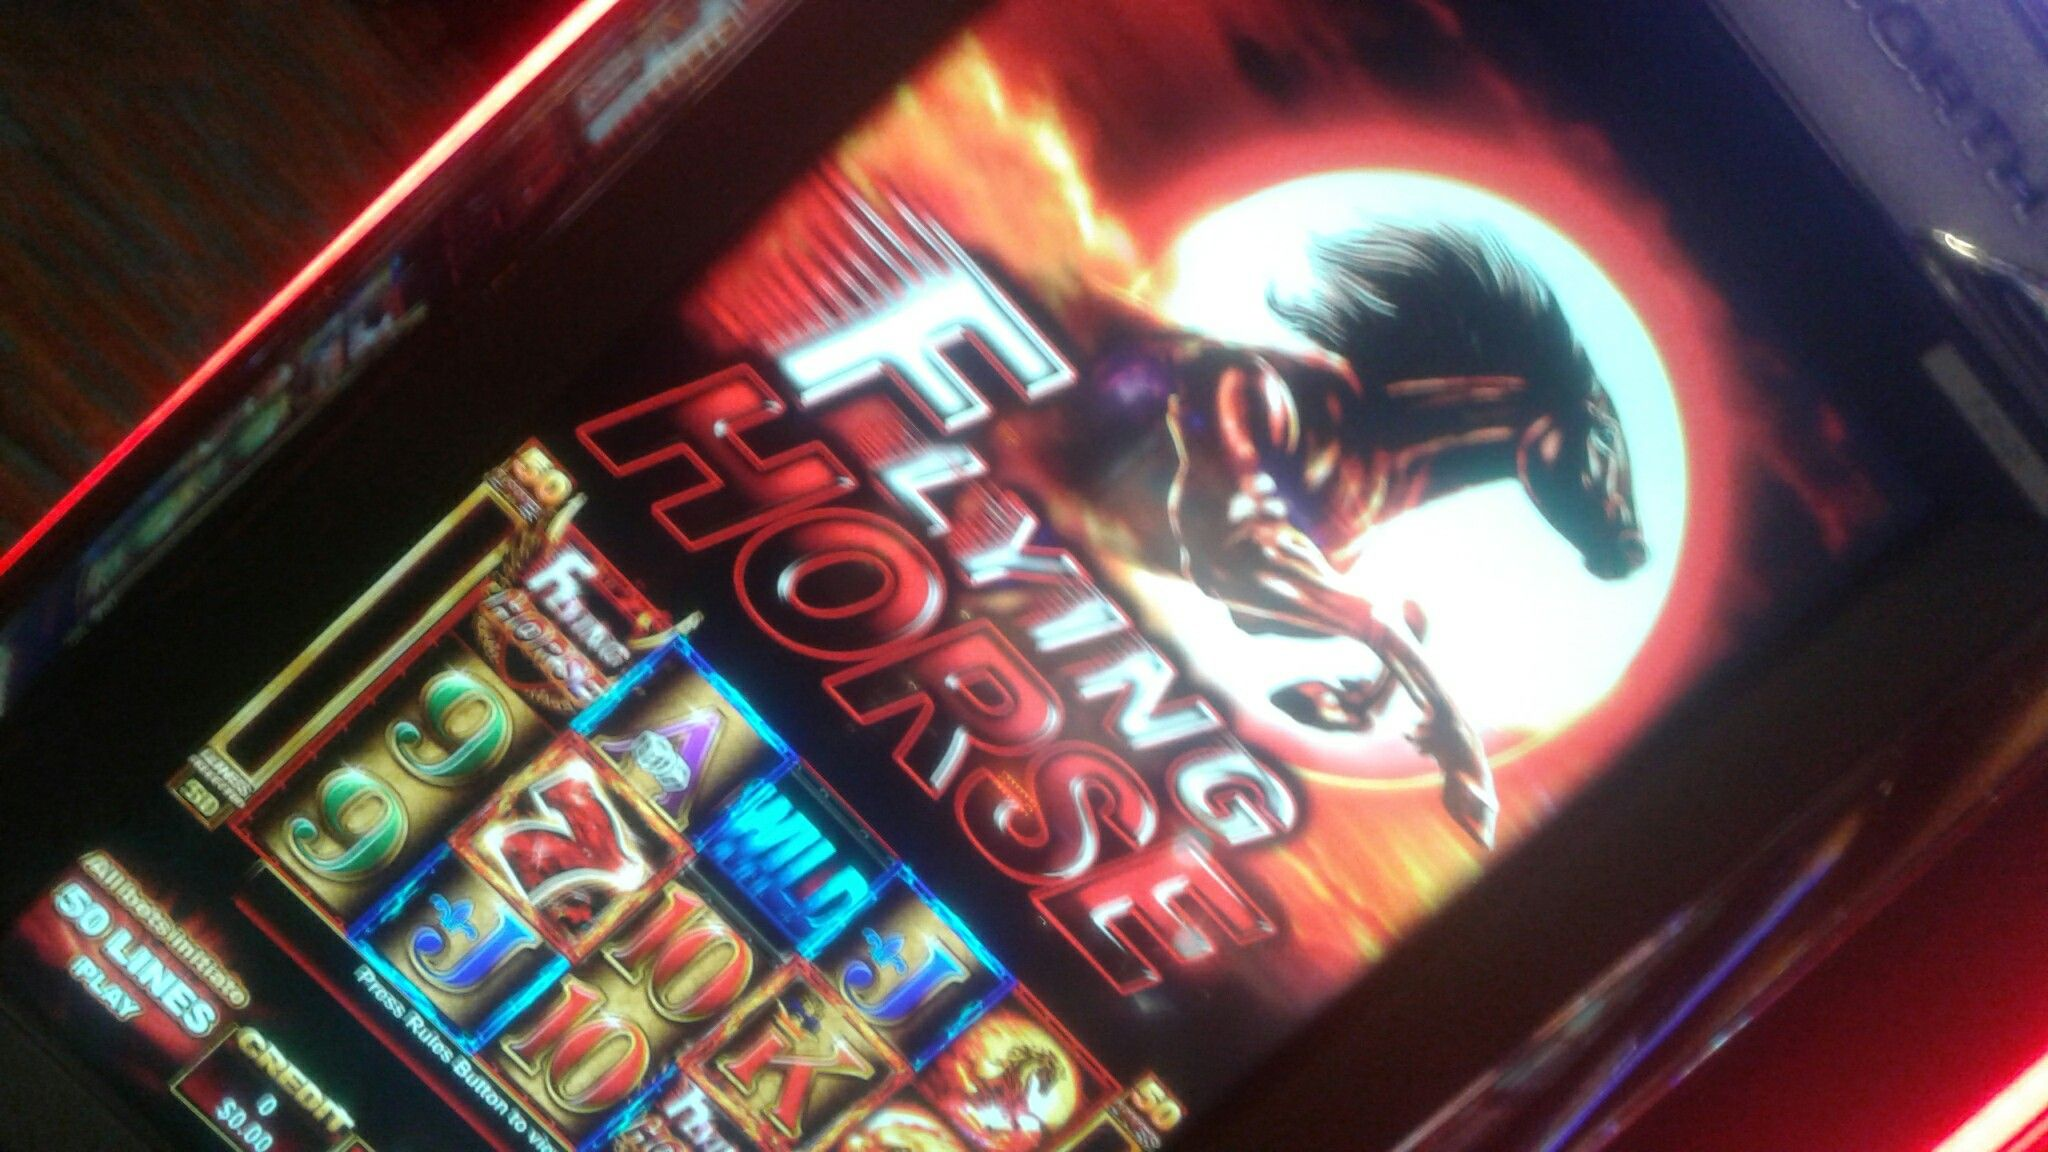 Kings casino poker